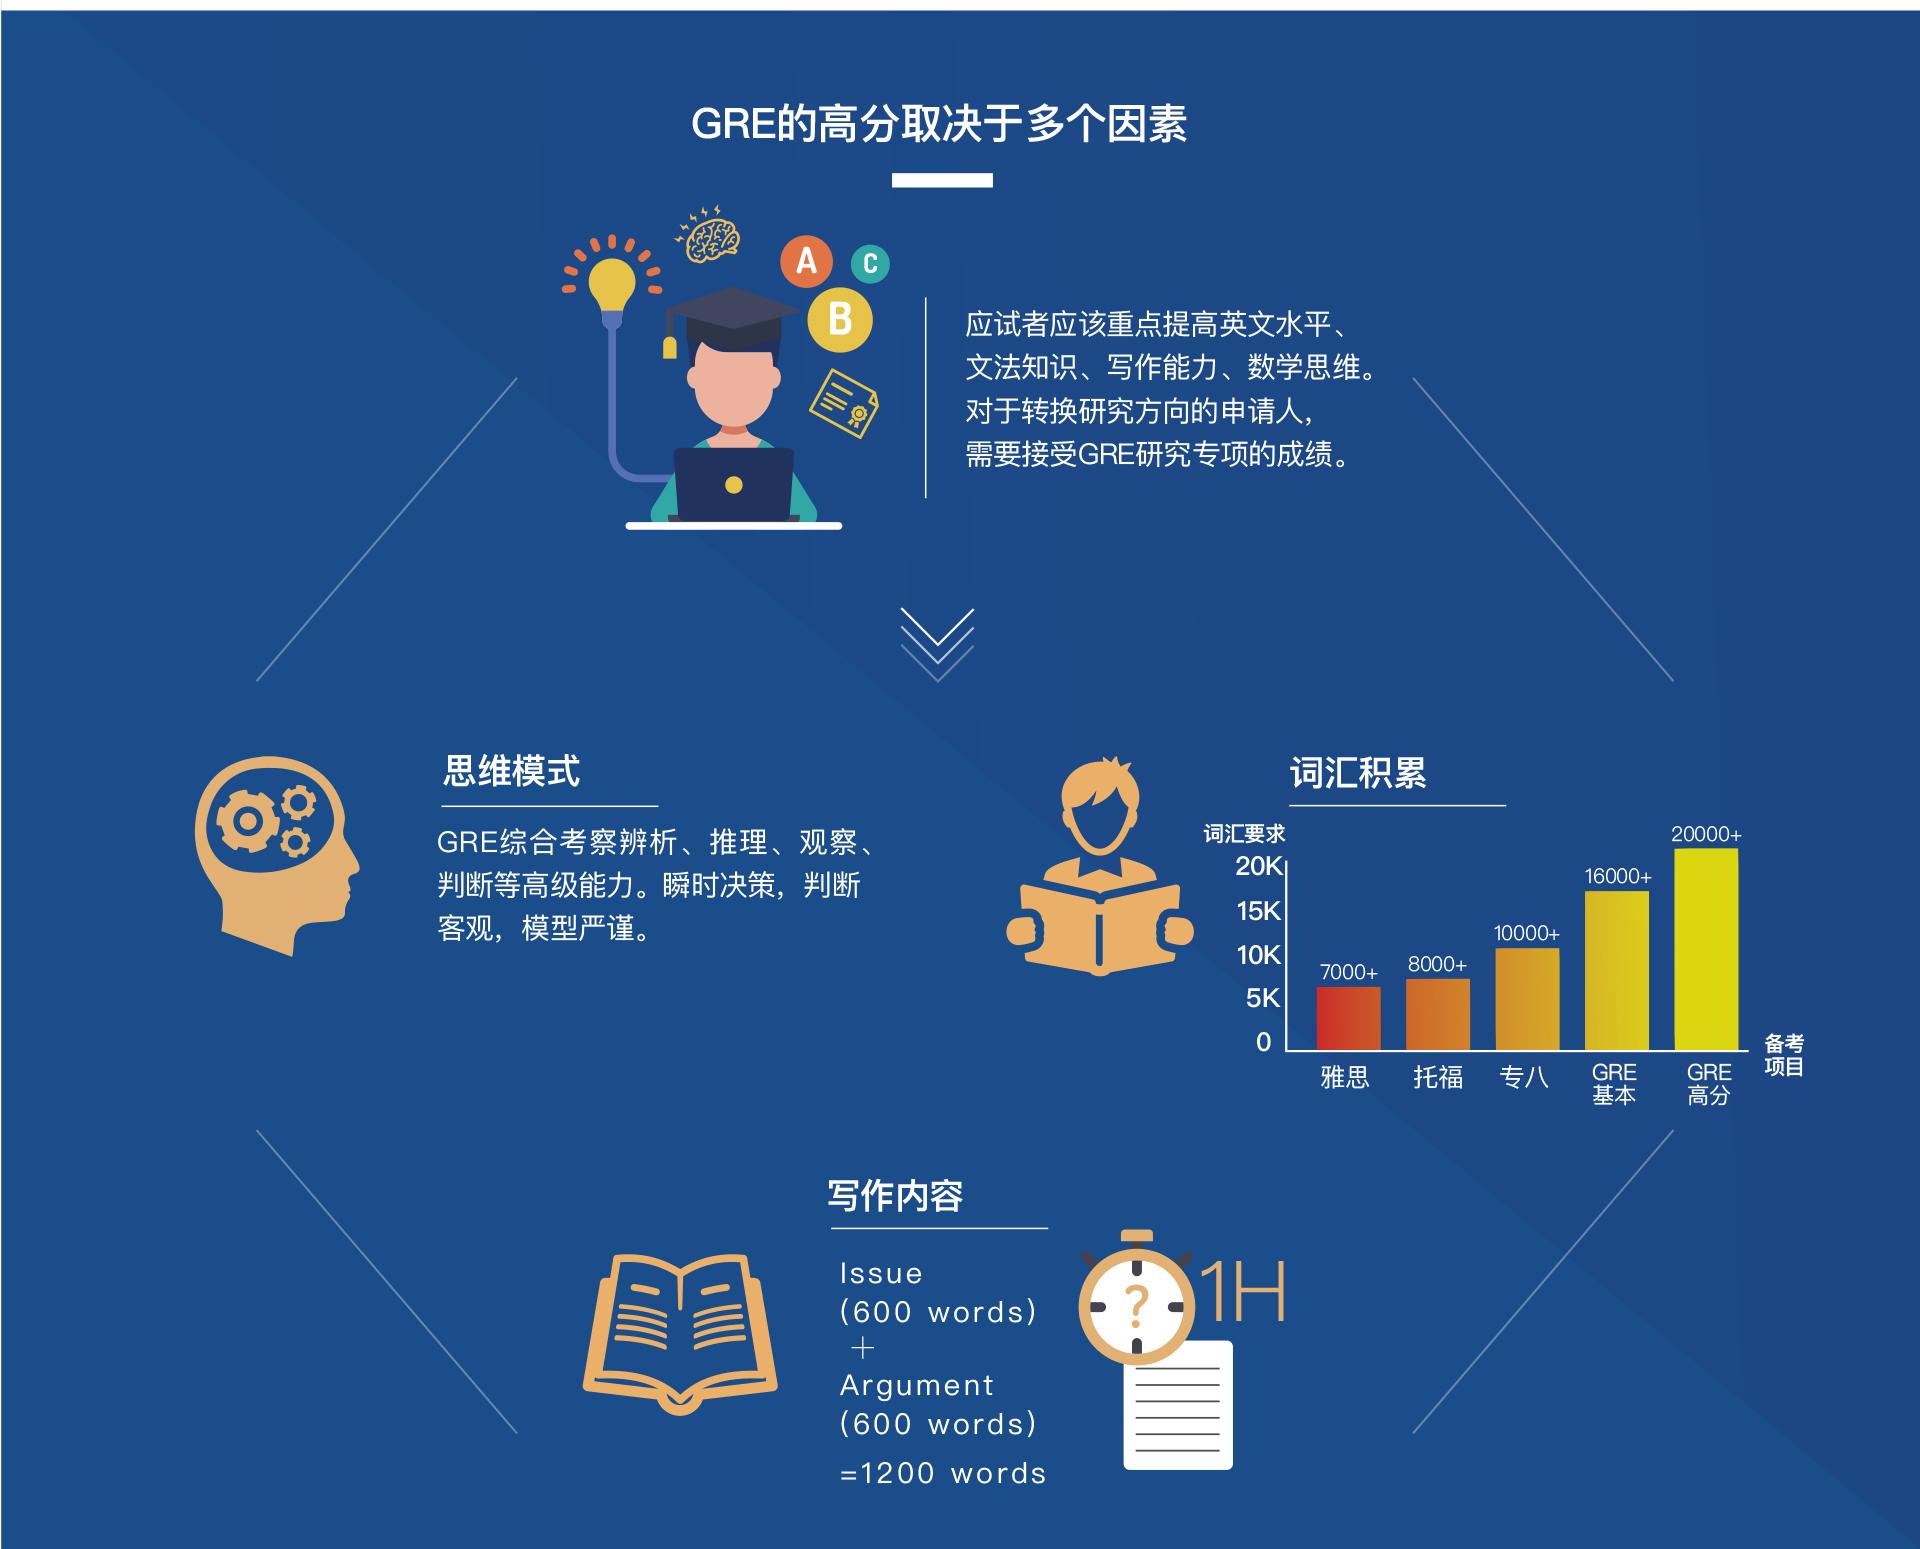 GRE的高分取决于多个因素,应试者应该重点提高英文水平、文法知识、写作能力、数学思维。对于转换研究方向的申请人,需要接受GRE研究专项的成绩。思维模式-GRE综合考察辨析、推理、观察、判断等高级能力。瞬时决策,判断客观,模型严谨。词汇积累,词汇要求,GRE综合考察辨析、推理、观察、判断等高级能力。瞬时决策,判断客观,模型严谨。